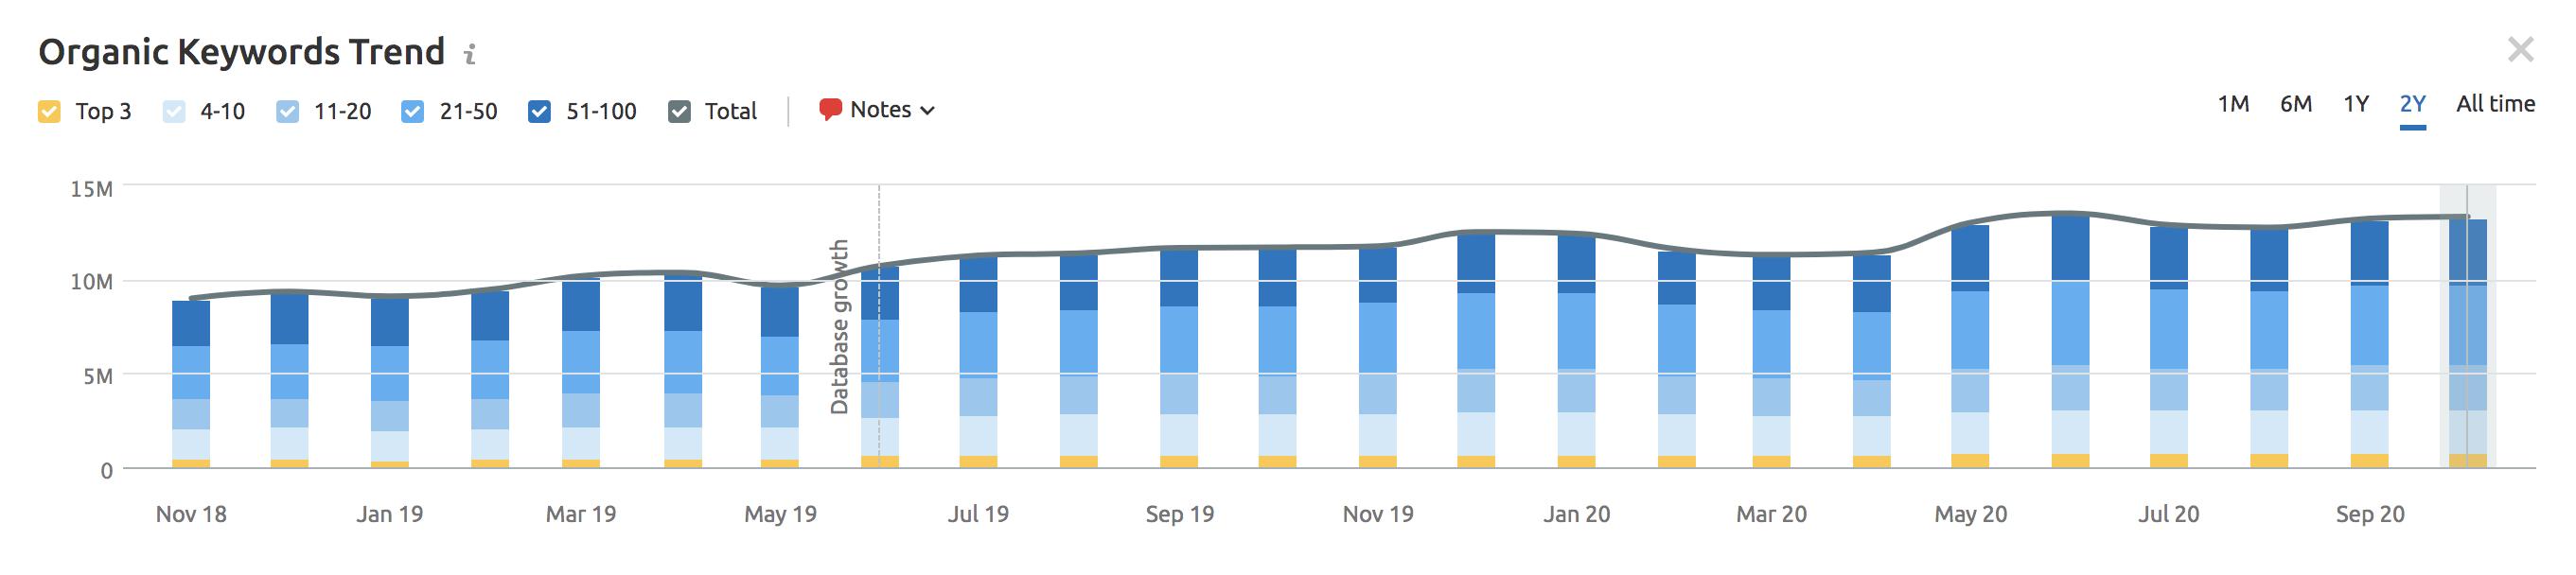 organic keyword tool trend